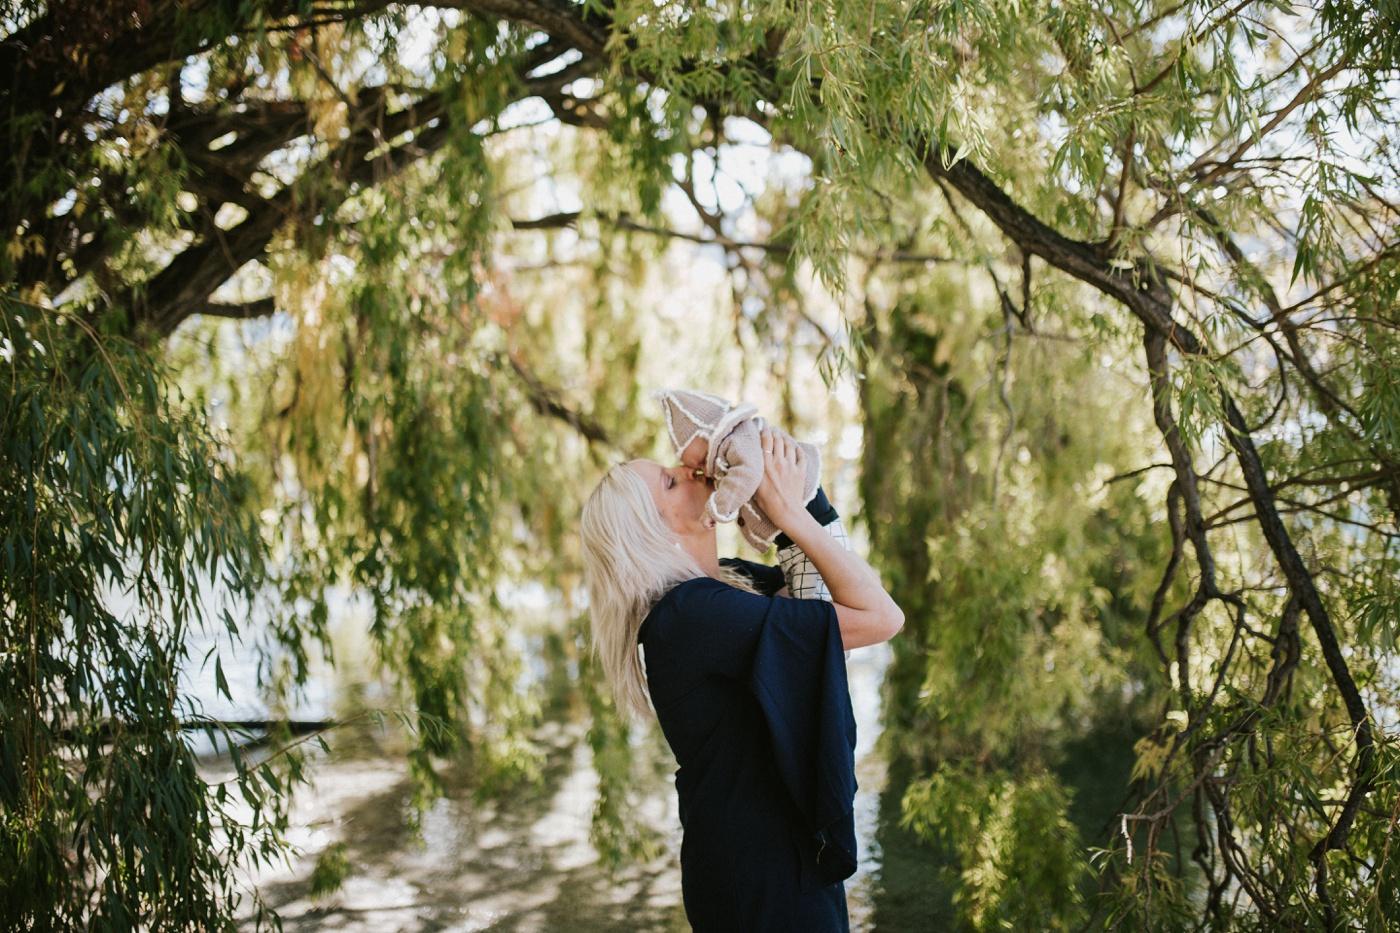 Blake-Lily-Rolig-Lekfull-Familjesession-Familjefotograf-Stockholm-Orebro_20